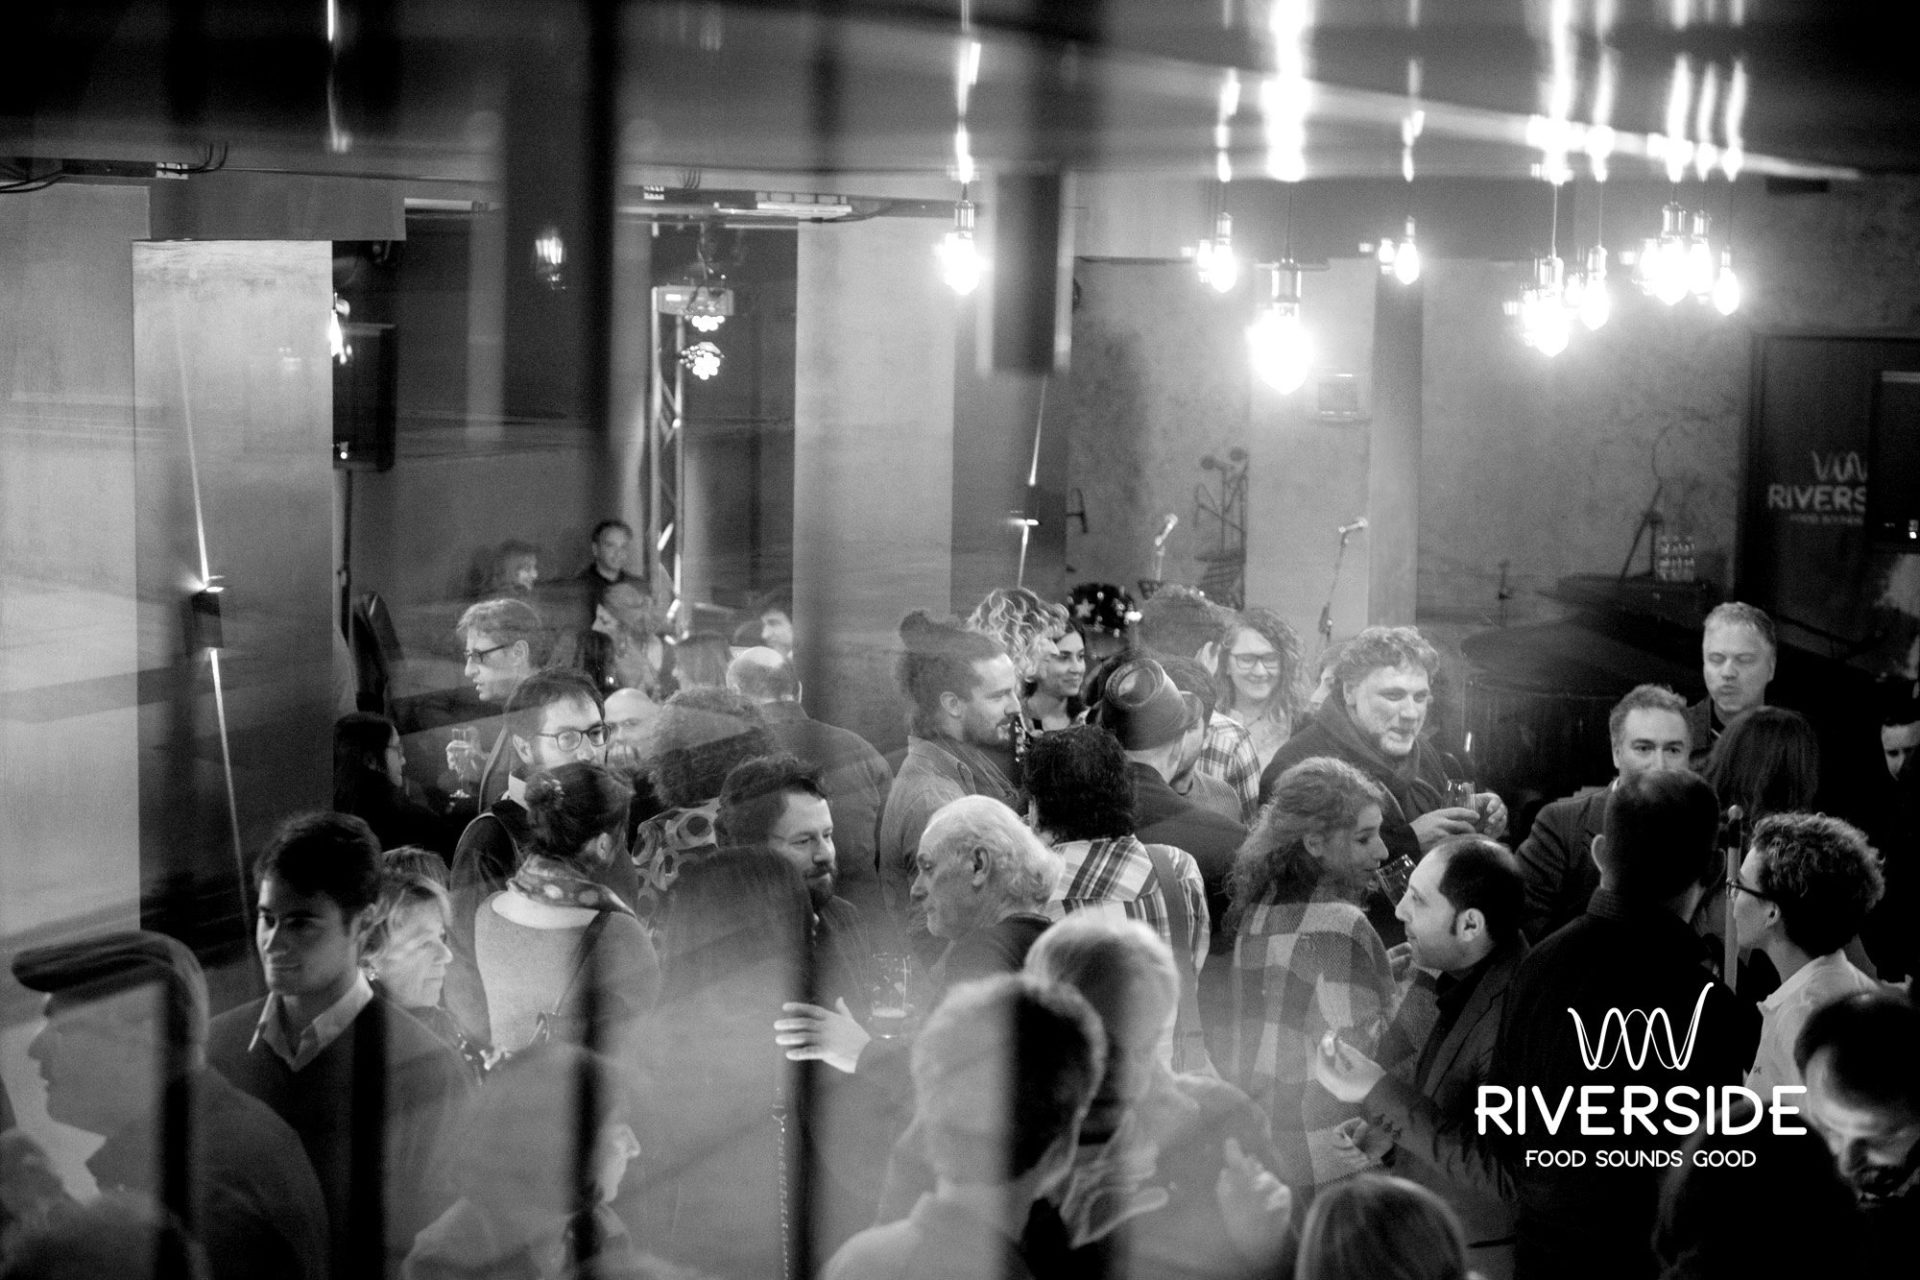 Riverside Rome - Food Sounds Good